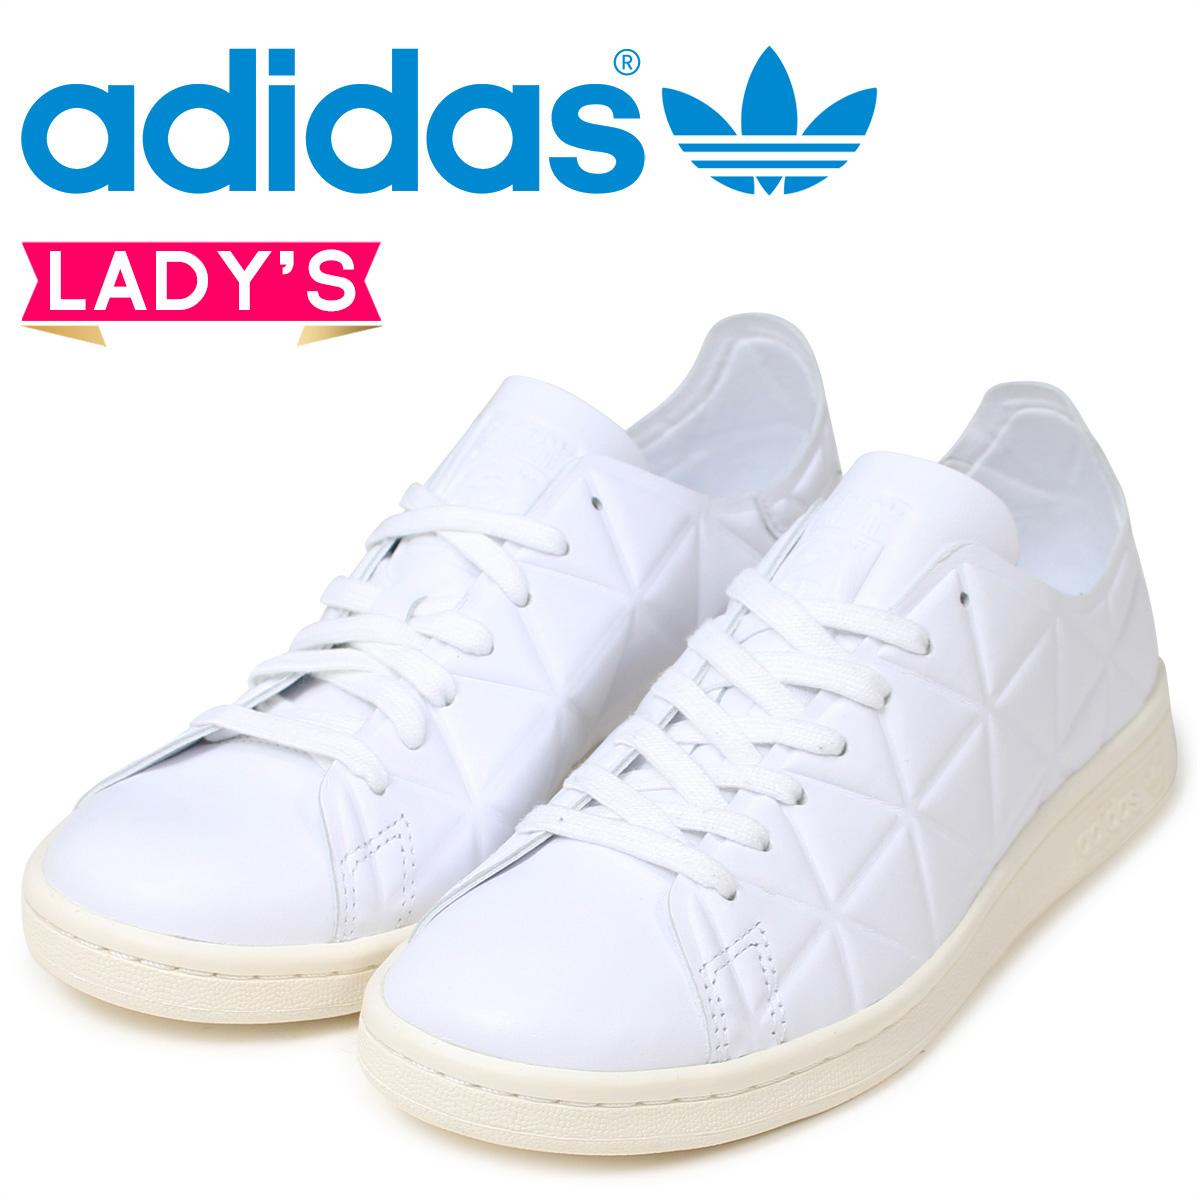 0399dd67e7 adidas Originals adidas originals Stan Smith polygon sneakers Womens STAN  SMITH W POLYGONE S76541 shoes white